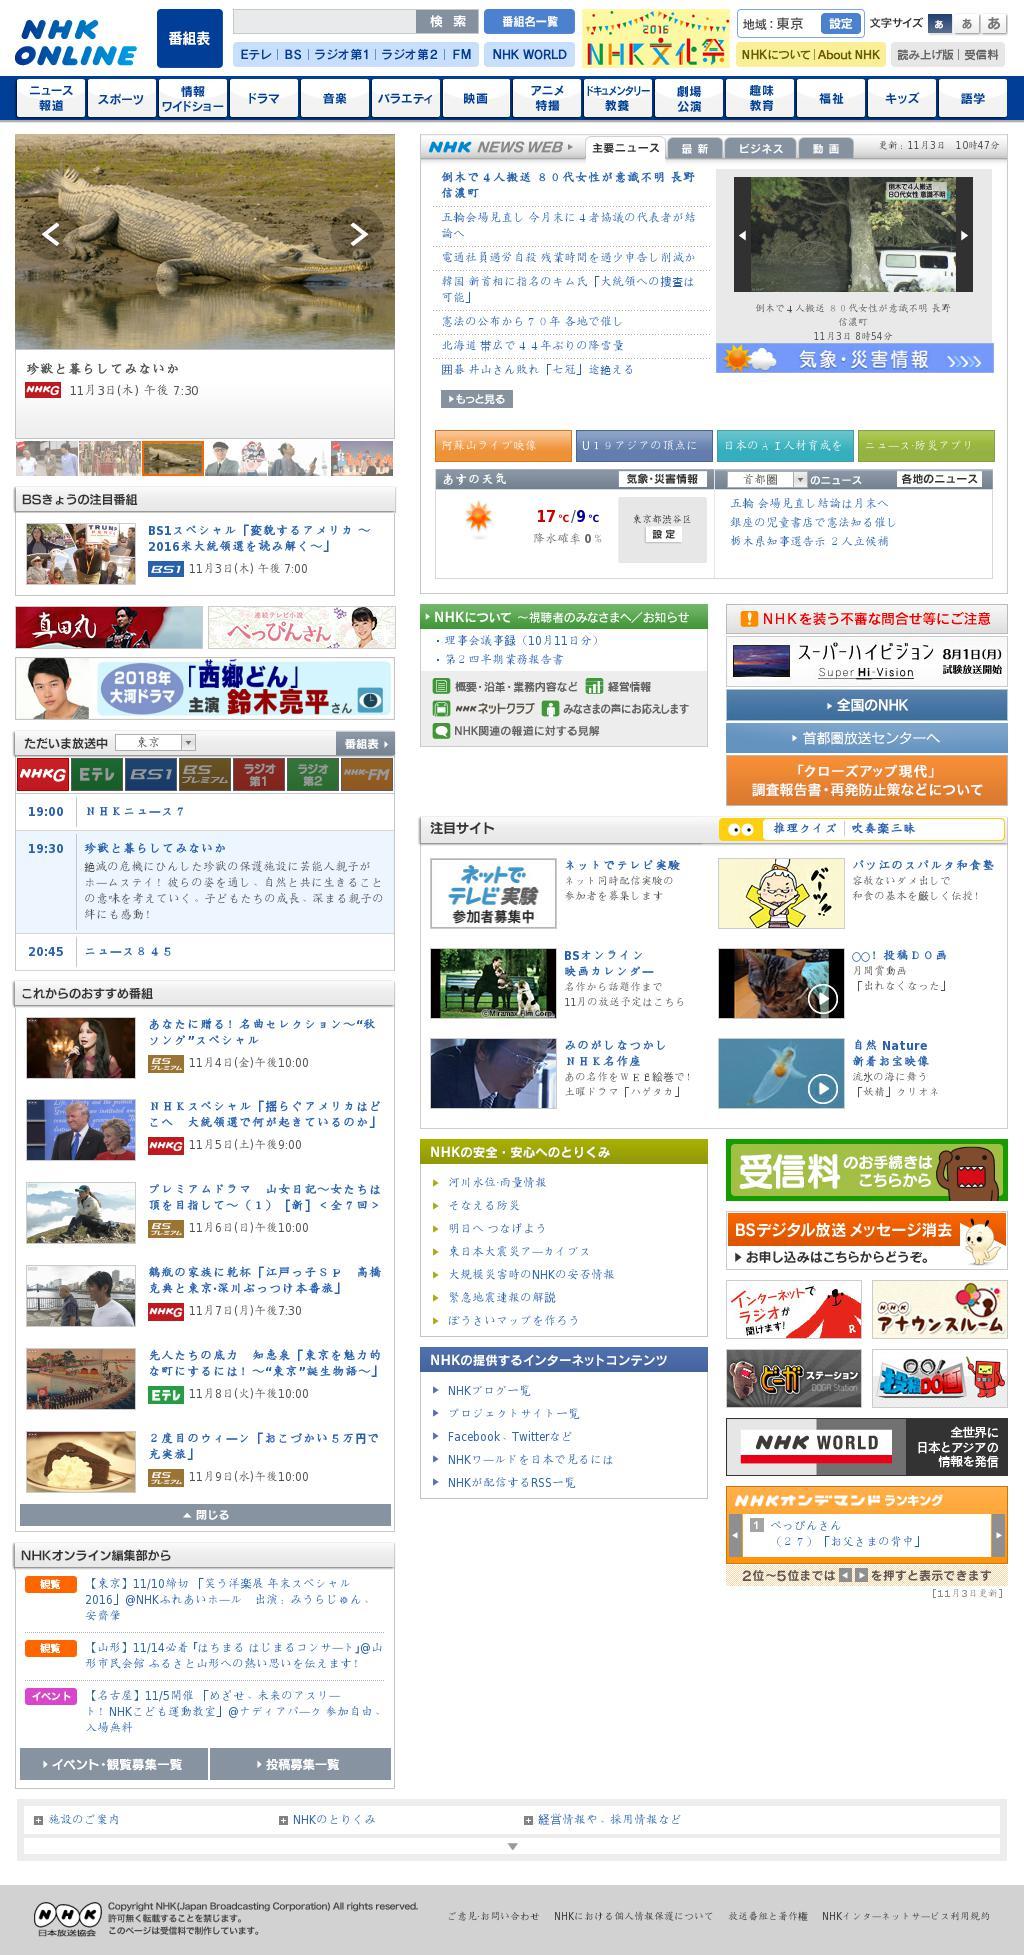 NHK Online at Thursday Nov. 3, 2016, 11:13 a.m. UTC